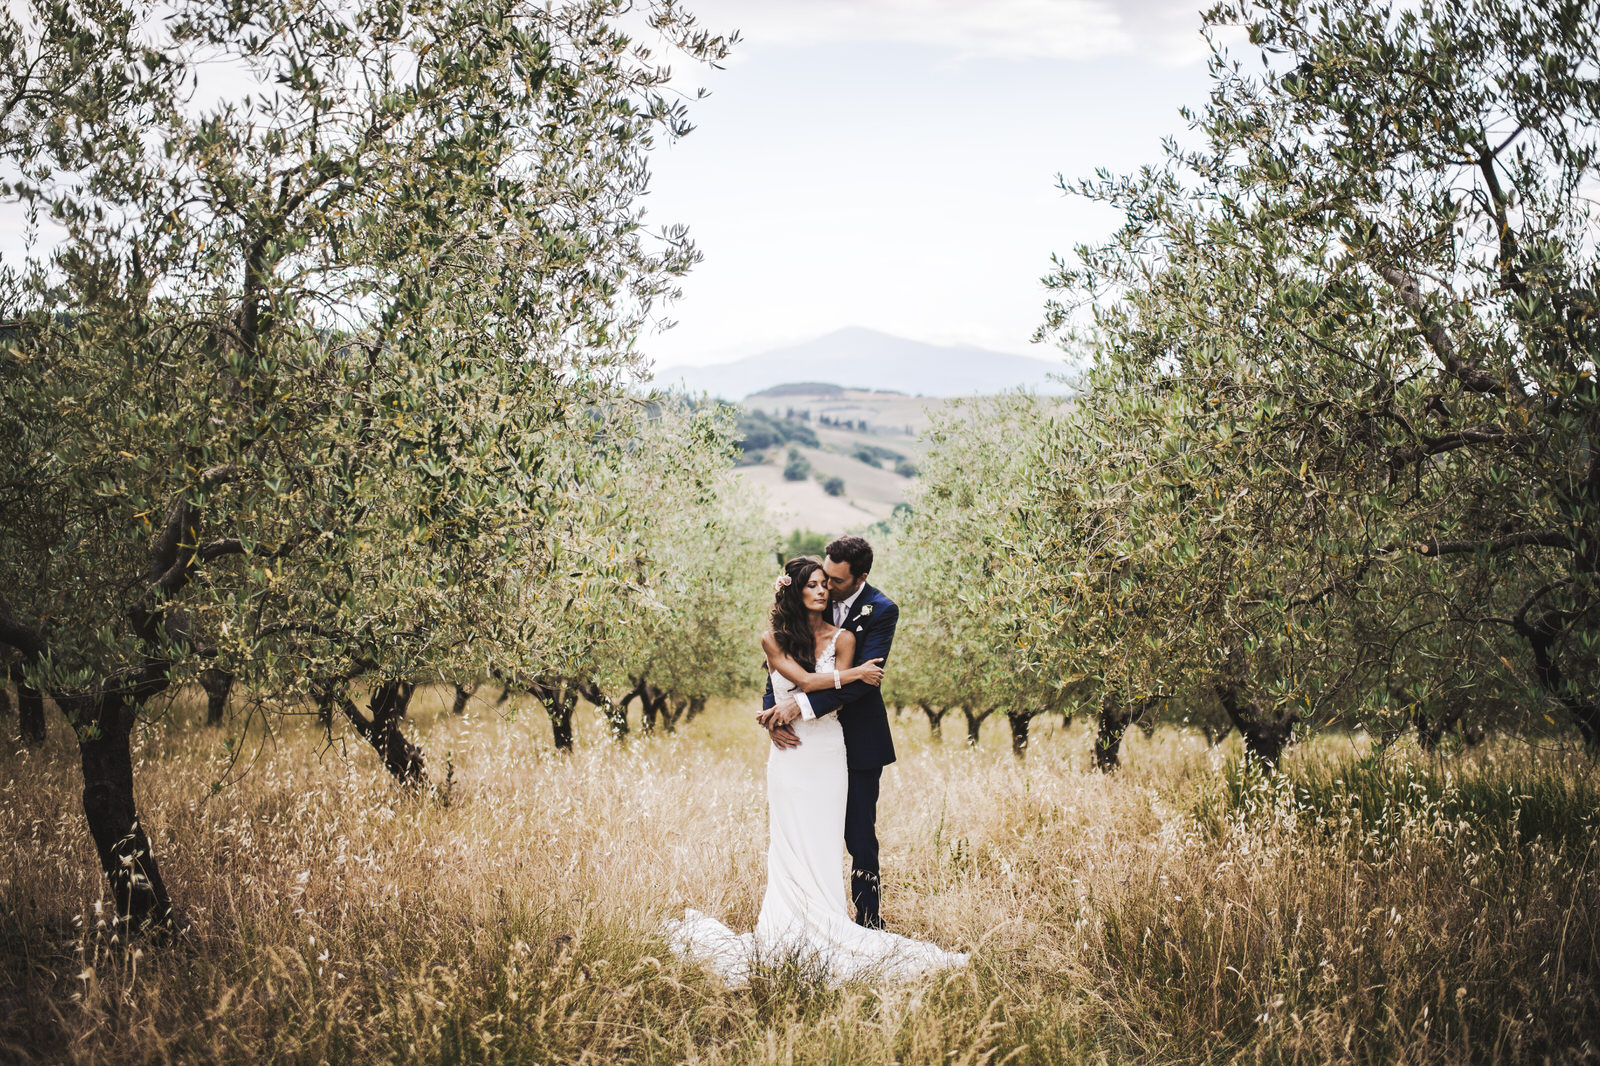 wedding photographer in italy-venice-tuscany-florence-amalfi coast-como lake-villa del balbianello-siena-amalfi-ravello-belmond-villa cimbrone42